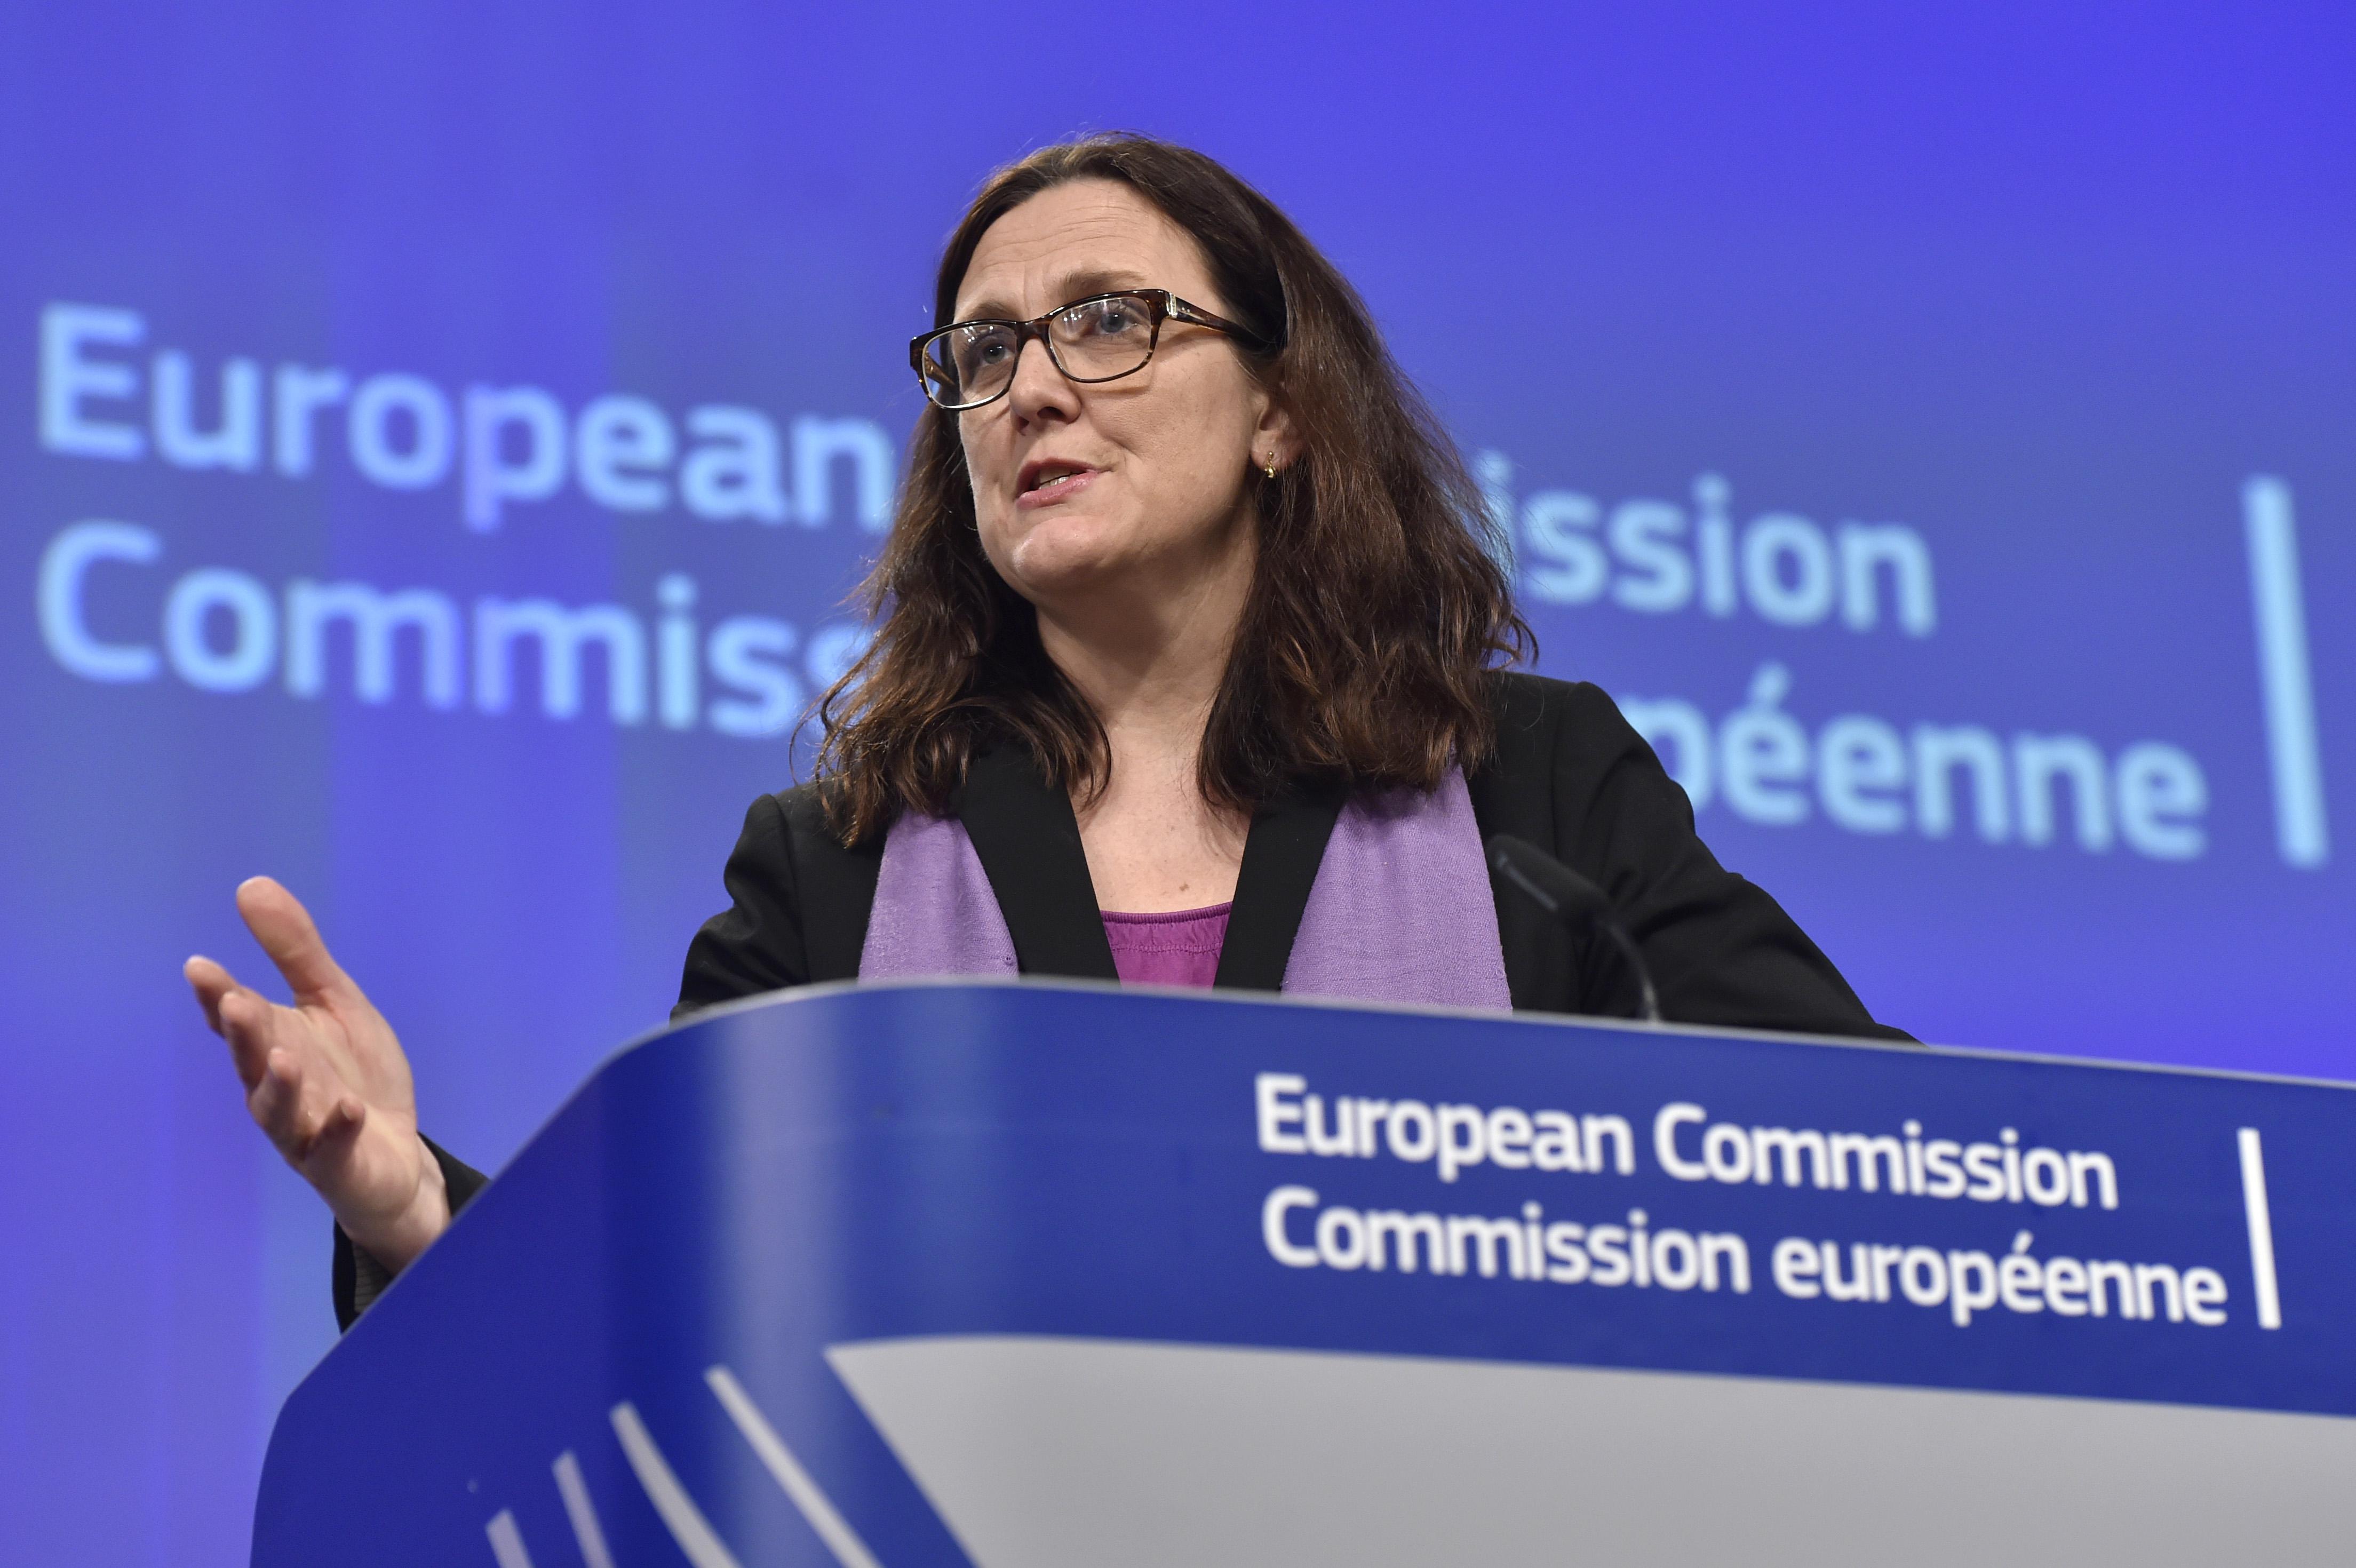 European Commissioner for Trade Cecilia Malmstroem has been a vocal critic of Cambodia's political crackdown. Photo: Eric Vidal